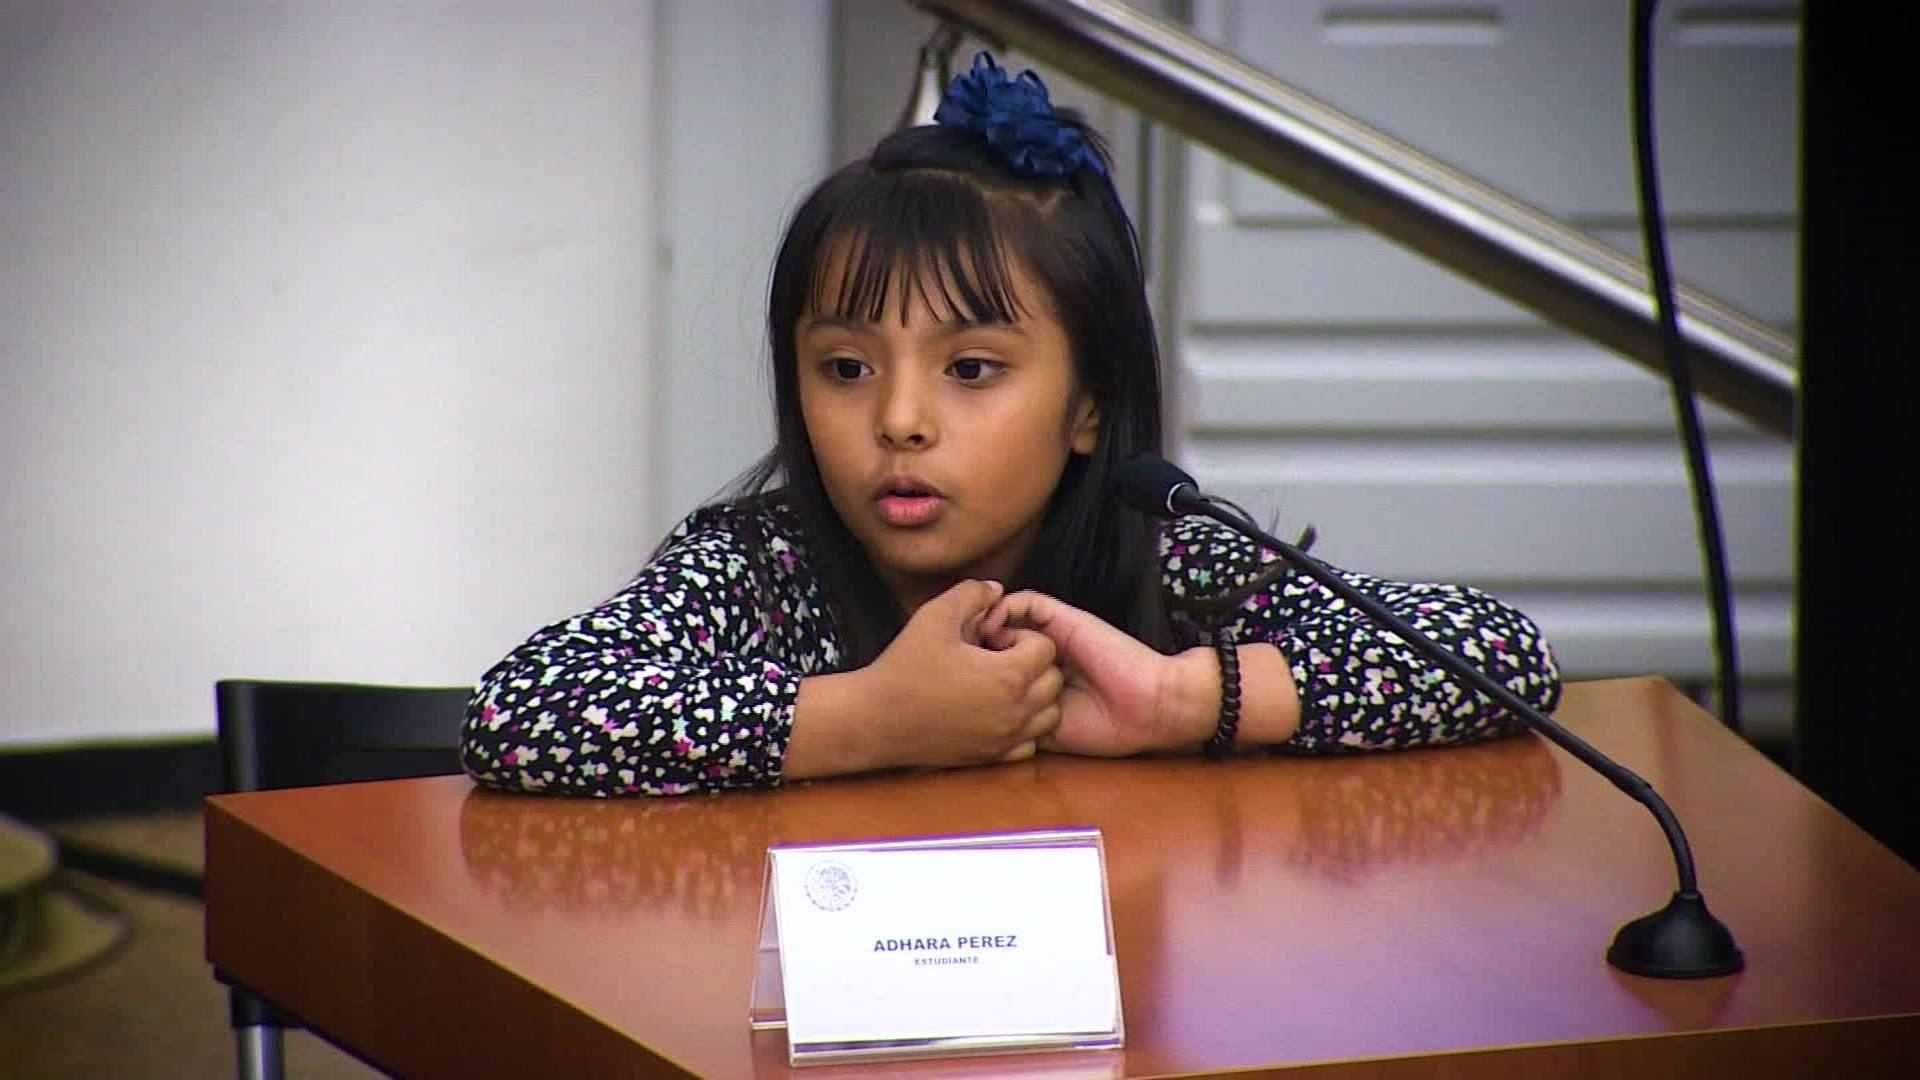 Adhara Pérez, la niña prodigio mexicana de 9 años